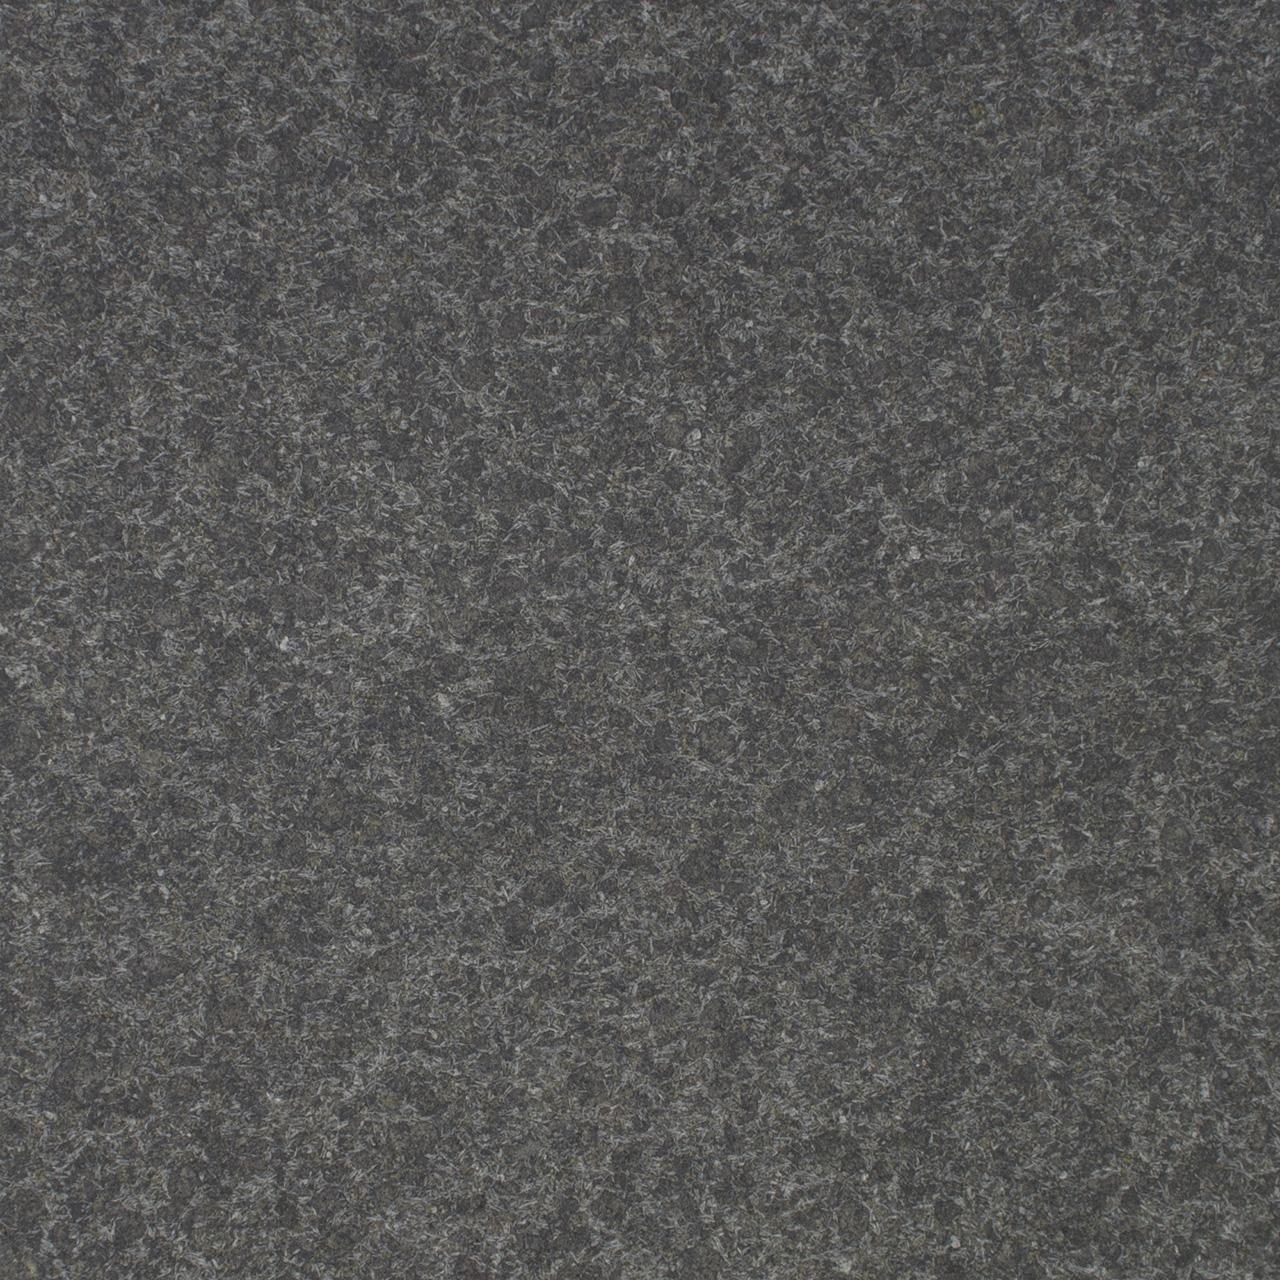 Basalt And Granite : Chattis black basalt cranbourne stone